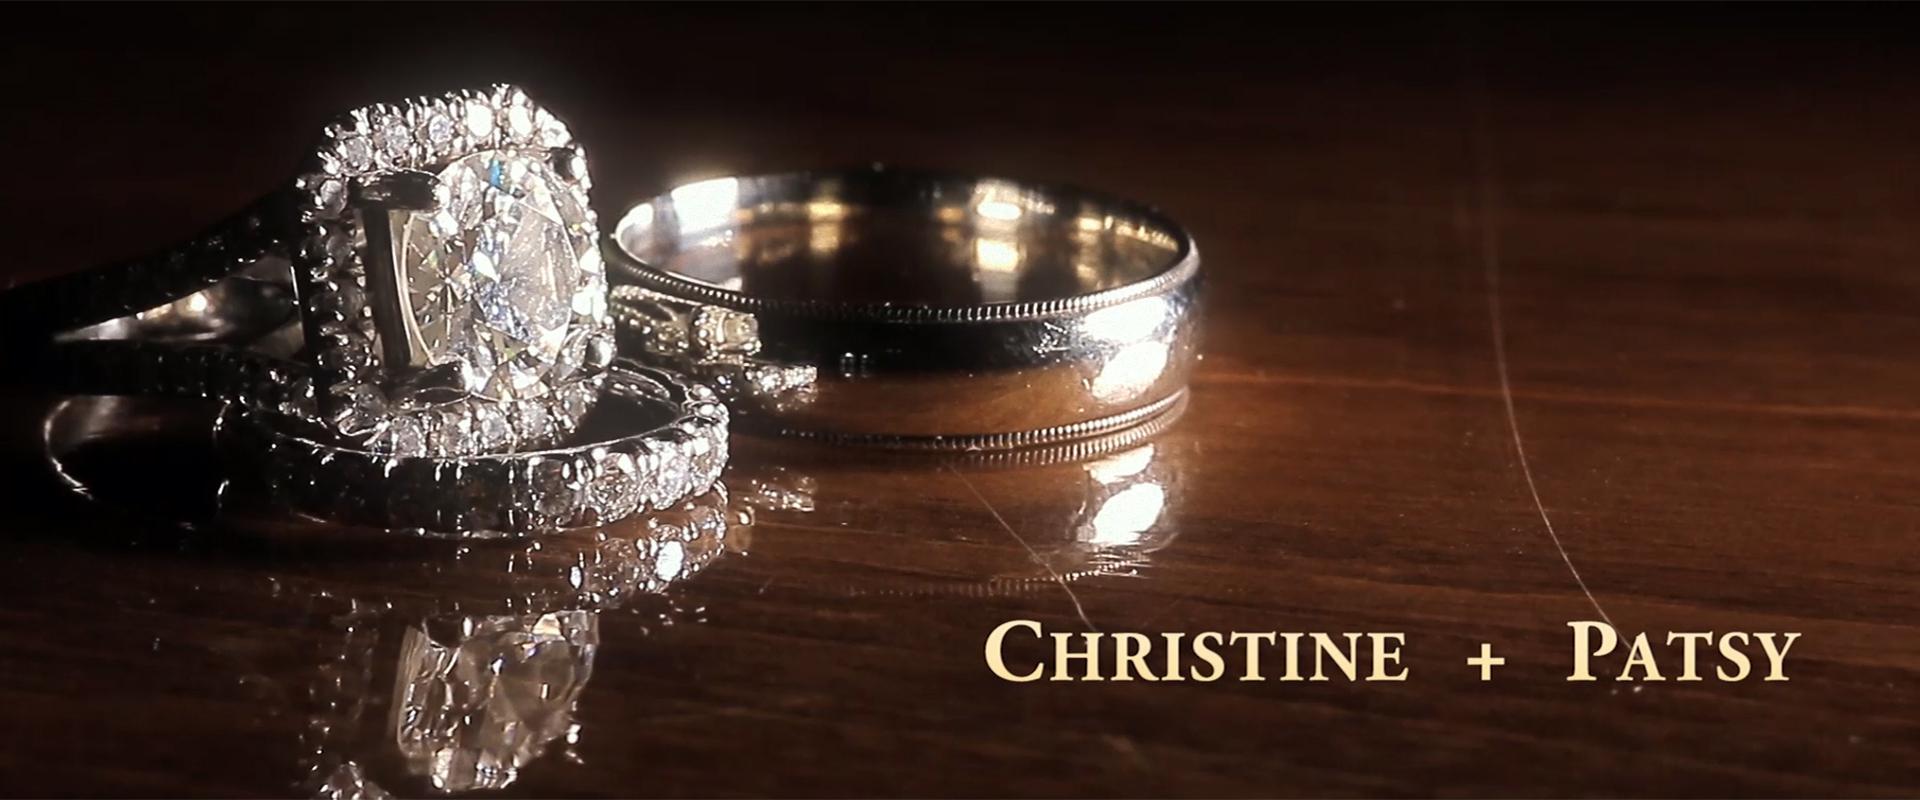 Christine + Patsy | Boca Raton, Florida | The Addison